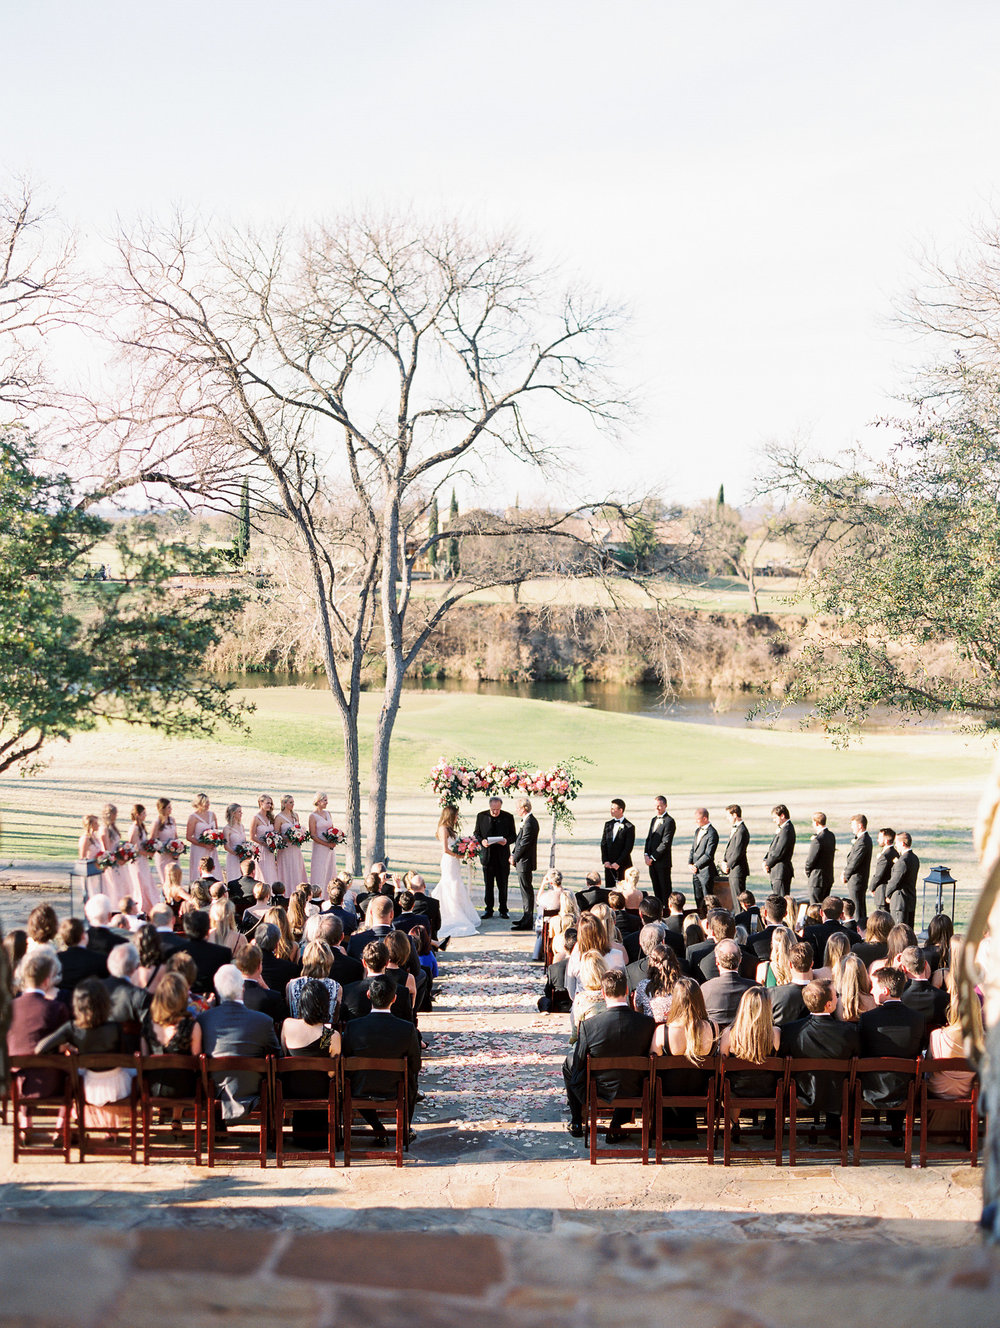 Escondido-Golf_Lake-Club-Hill-Country-Houston-Wedding-Photographer-Best-Top-Luxury-Destination-Engagements-Portrait-Austin-Photography-26.jpg